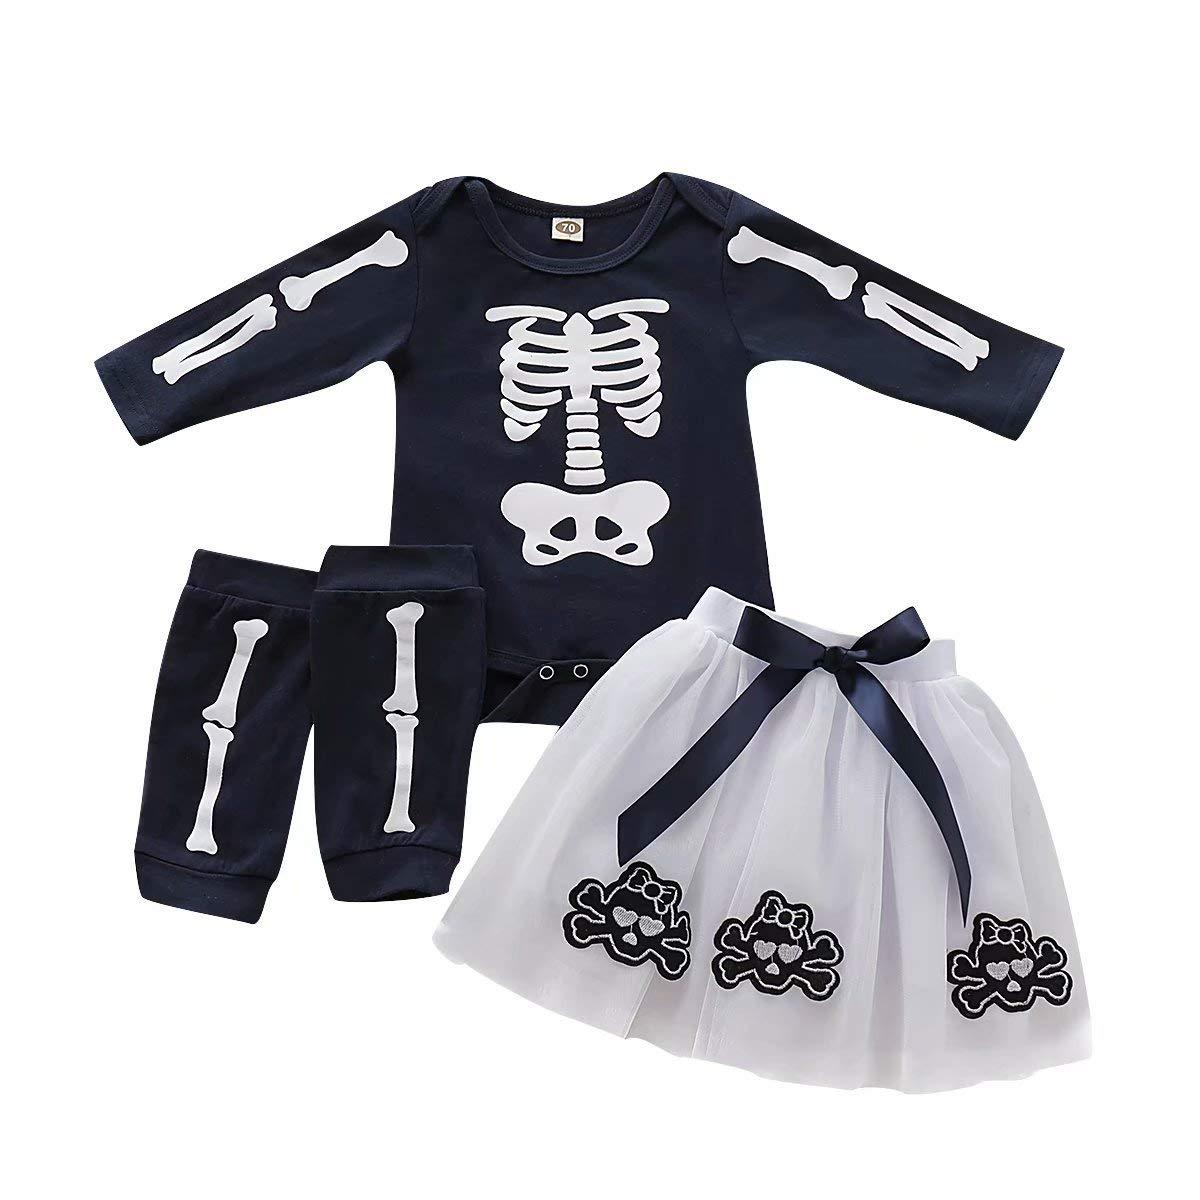 Jobakids Baby Girls Long Sleeve Halloween Shirt and Skirt Set Skull Tutu Sets Chiffon Dress with Leg Warmer